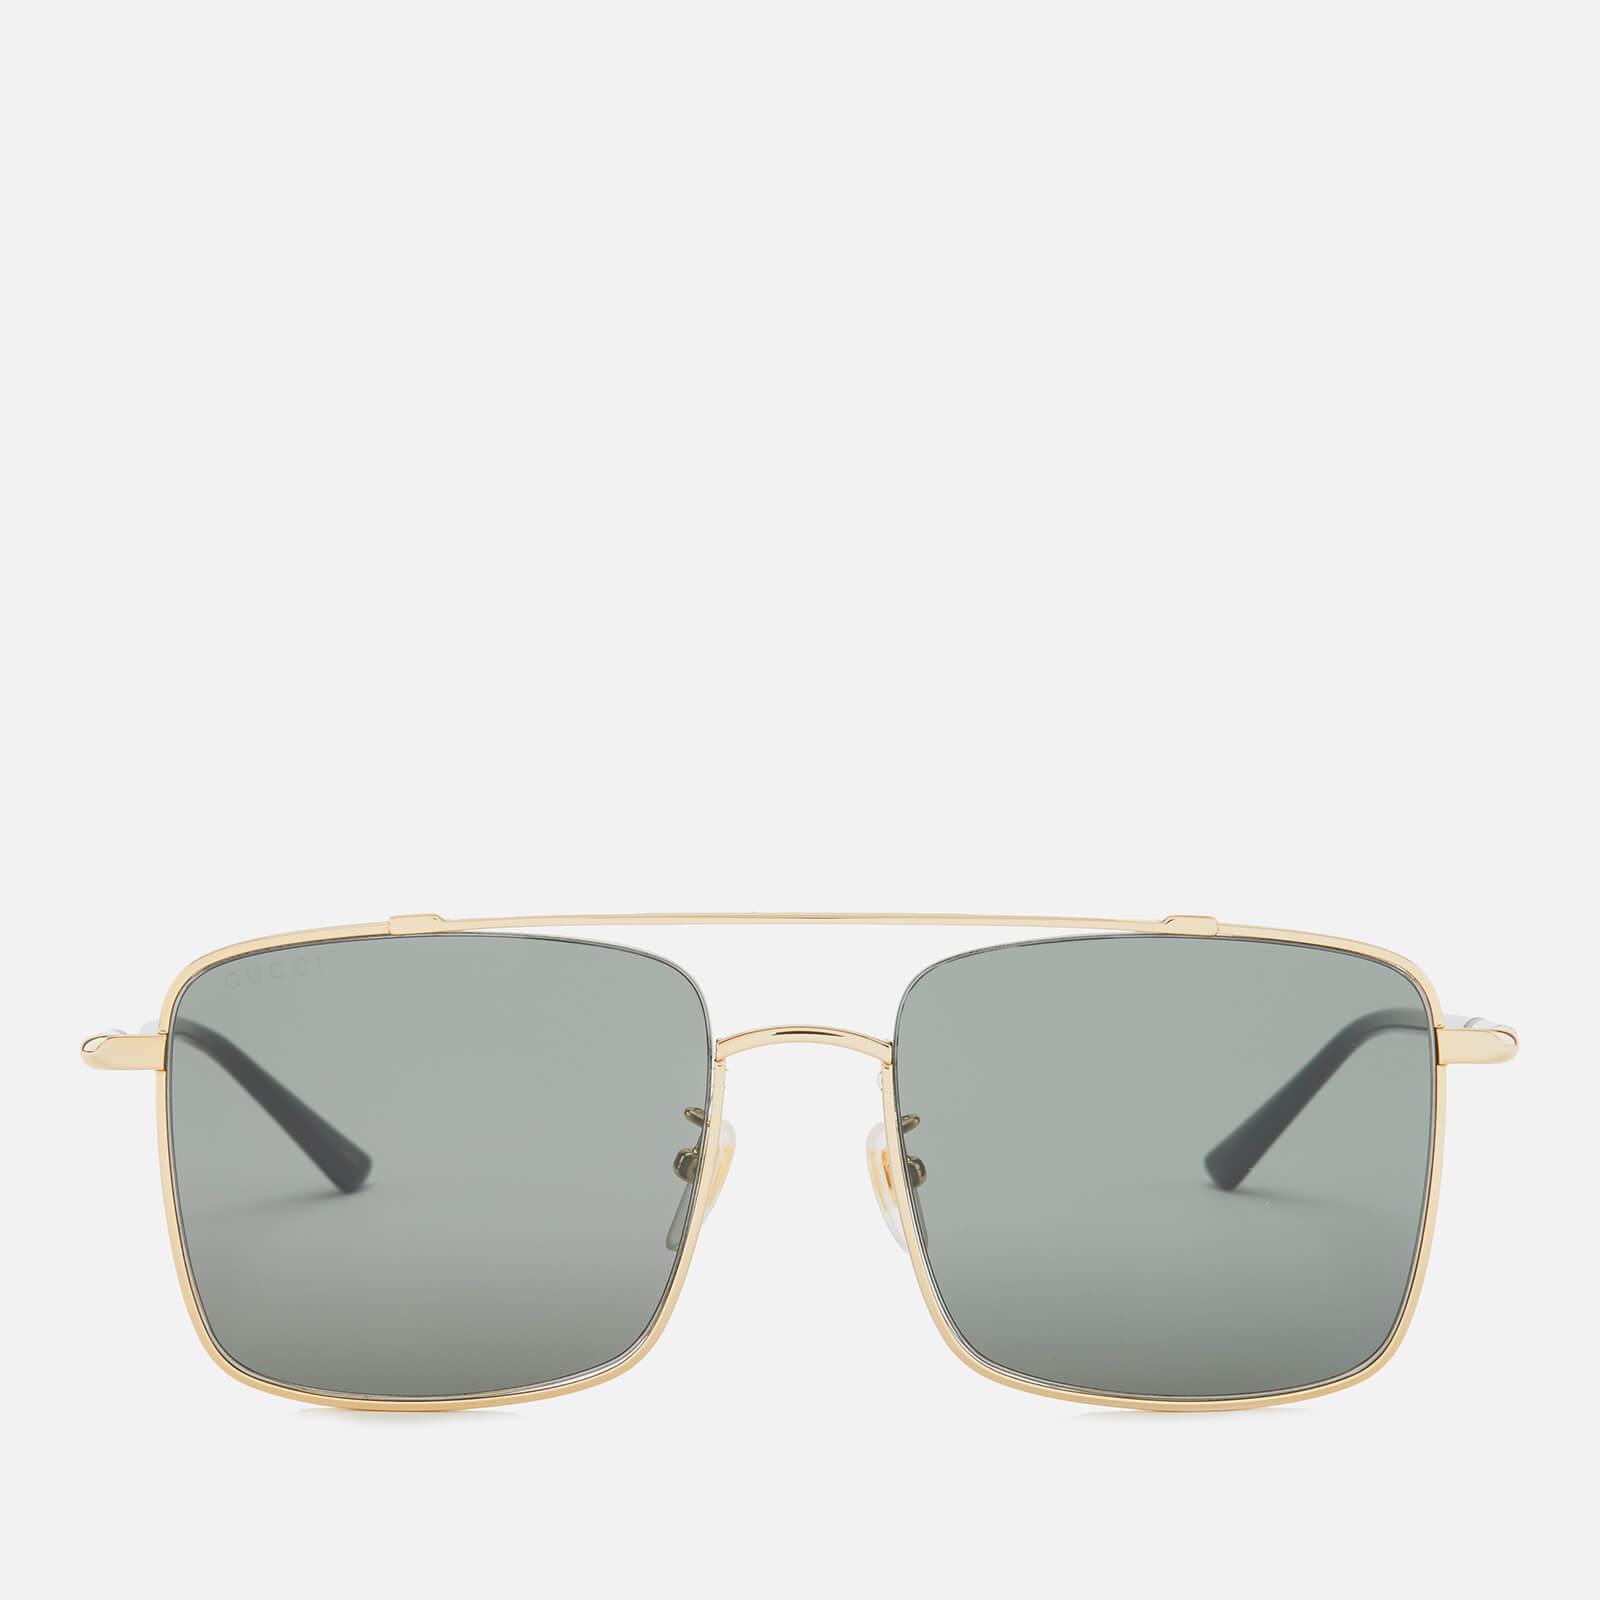 Gucci Men's Square Metal Aviator Sunglasses - Gold/Black/Grey